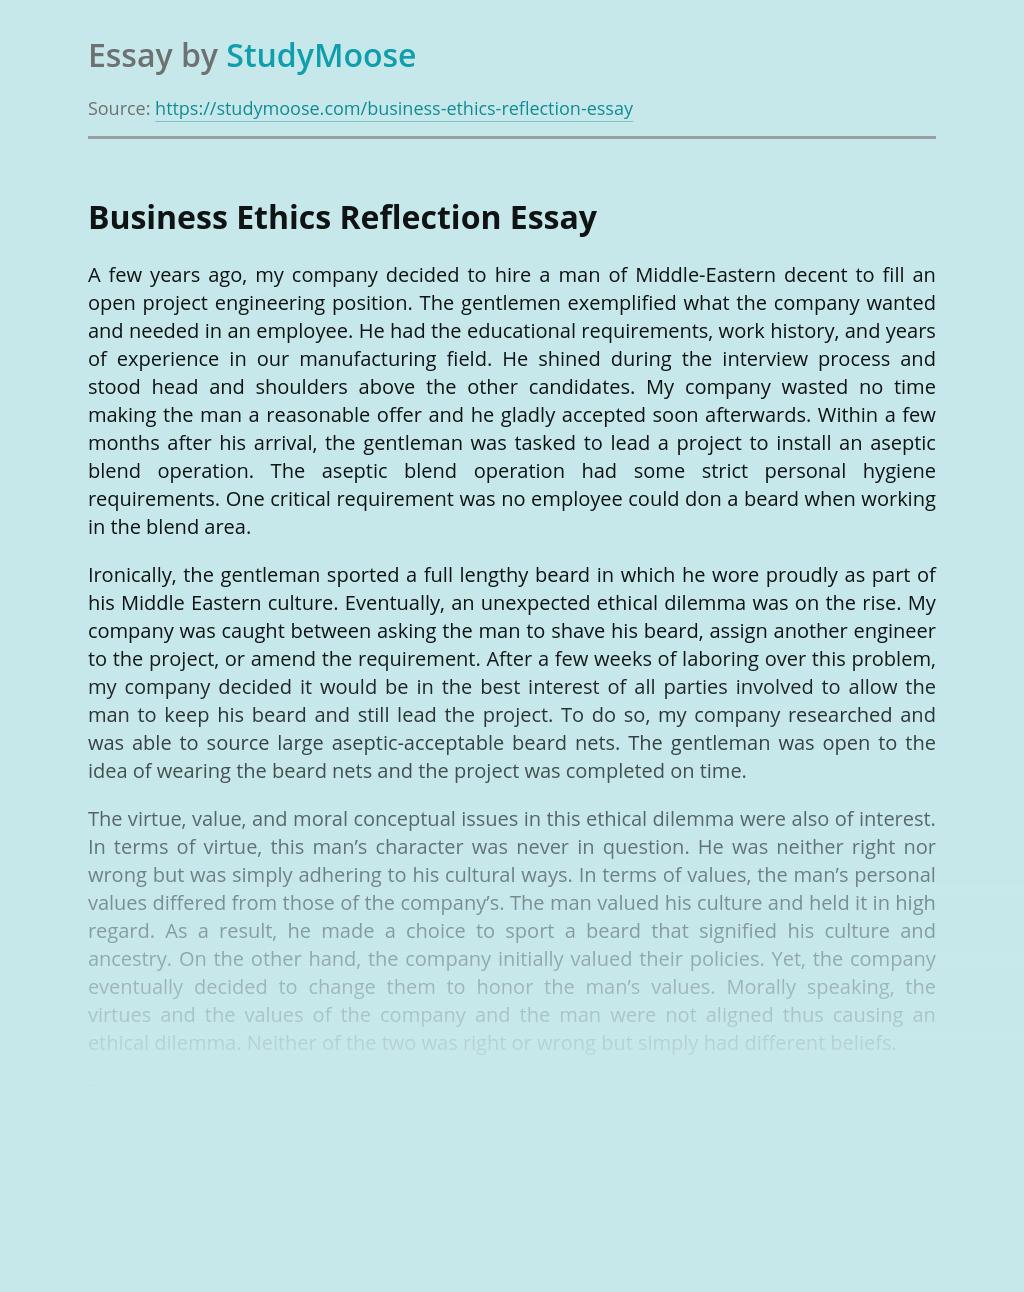 Business Ethics Reflection